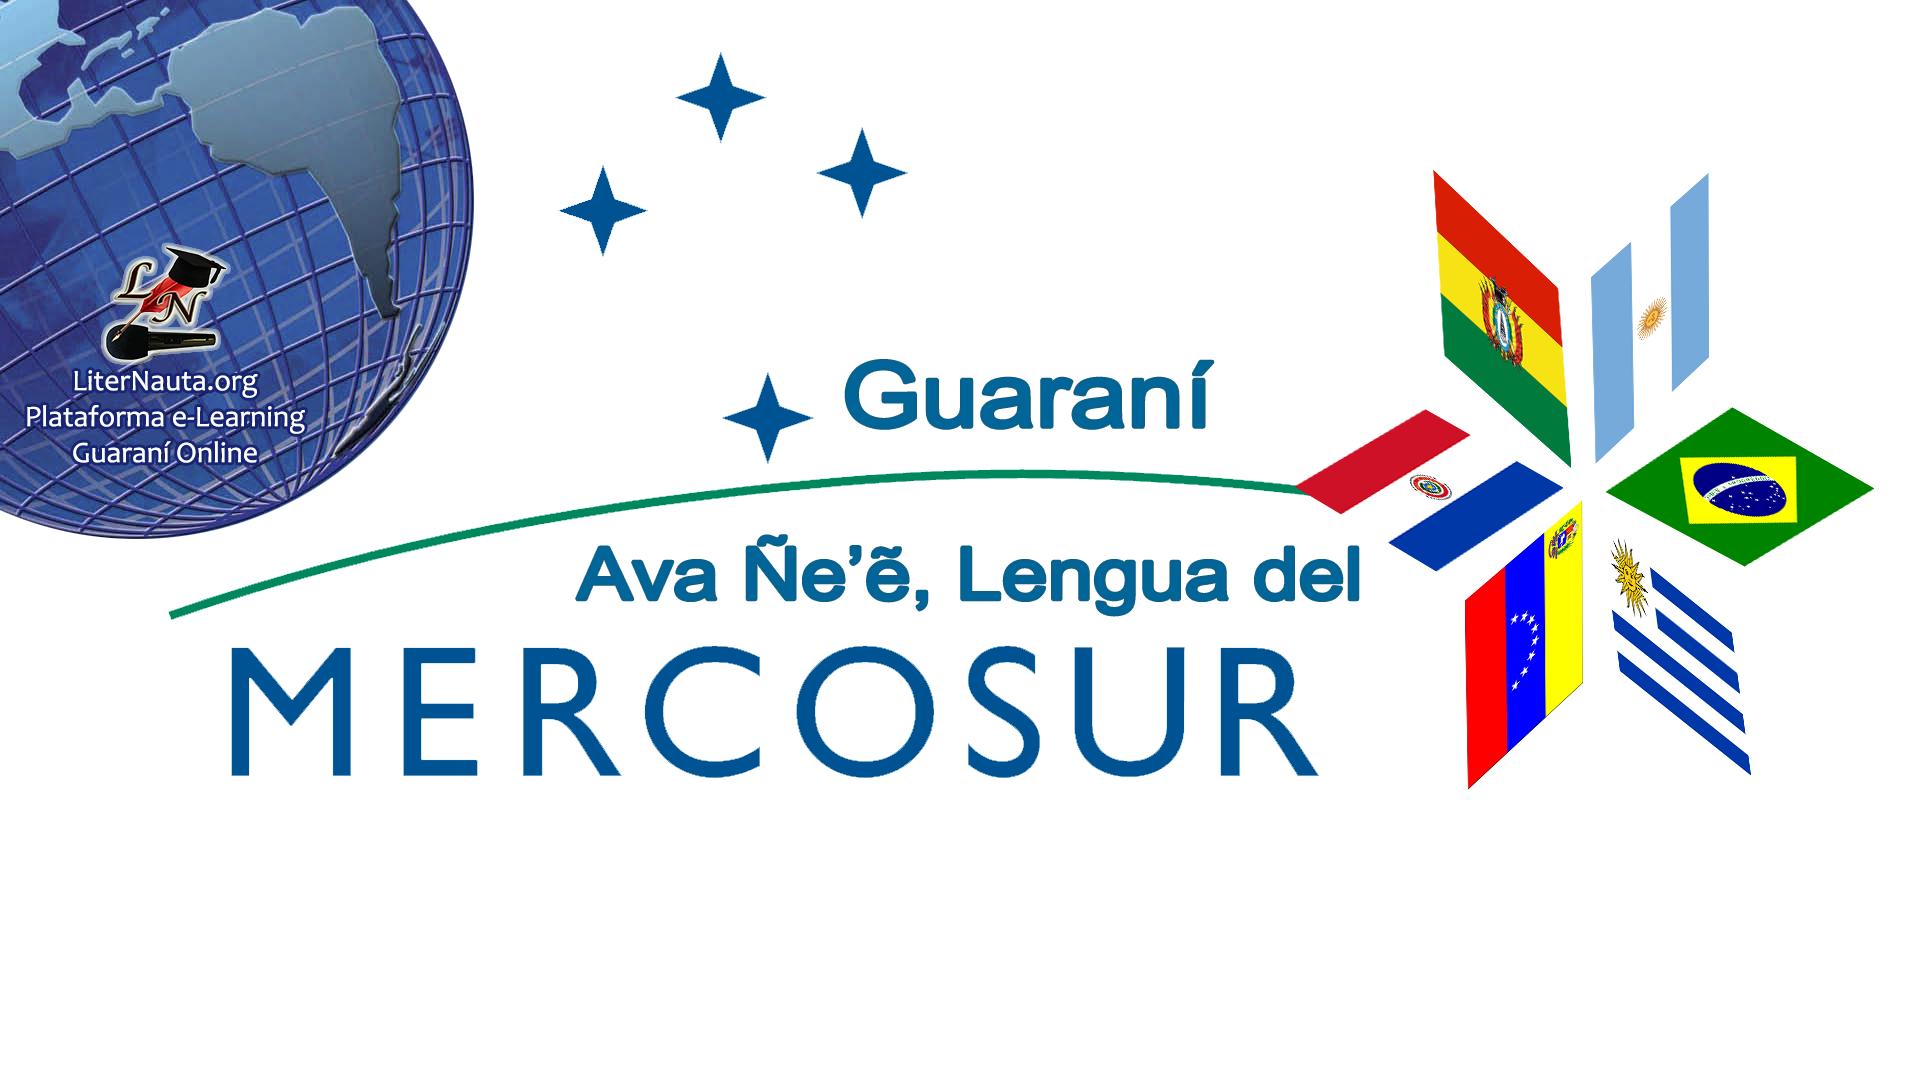 mercosur-liternauta-guarani-online